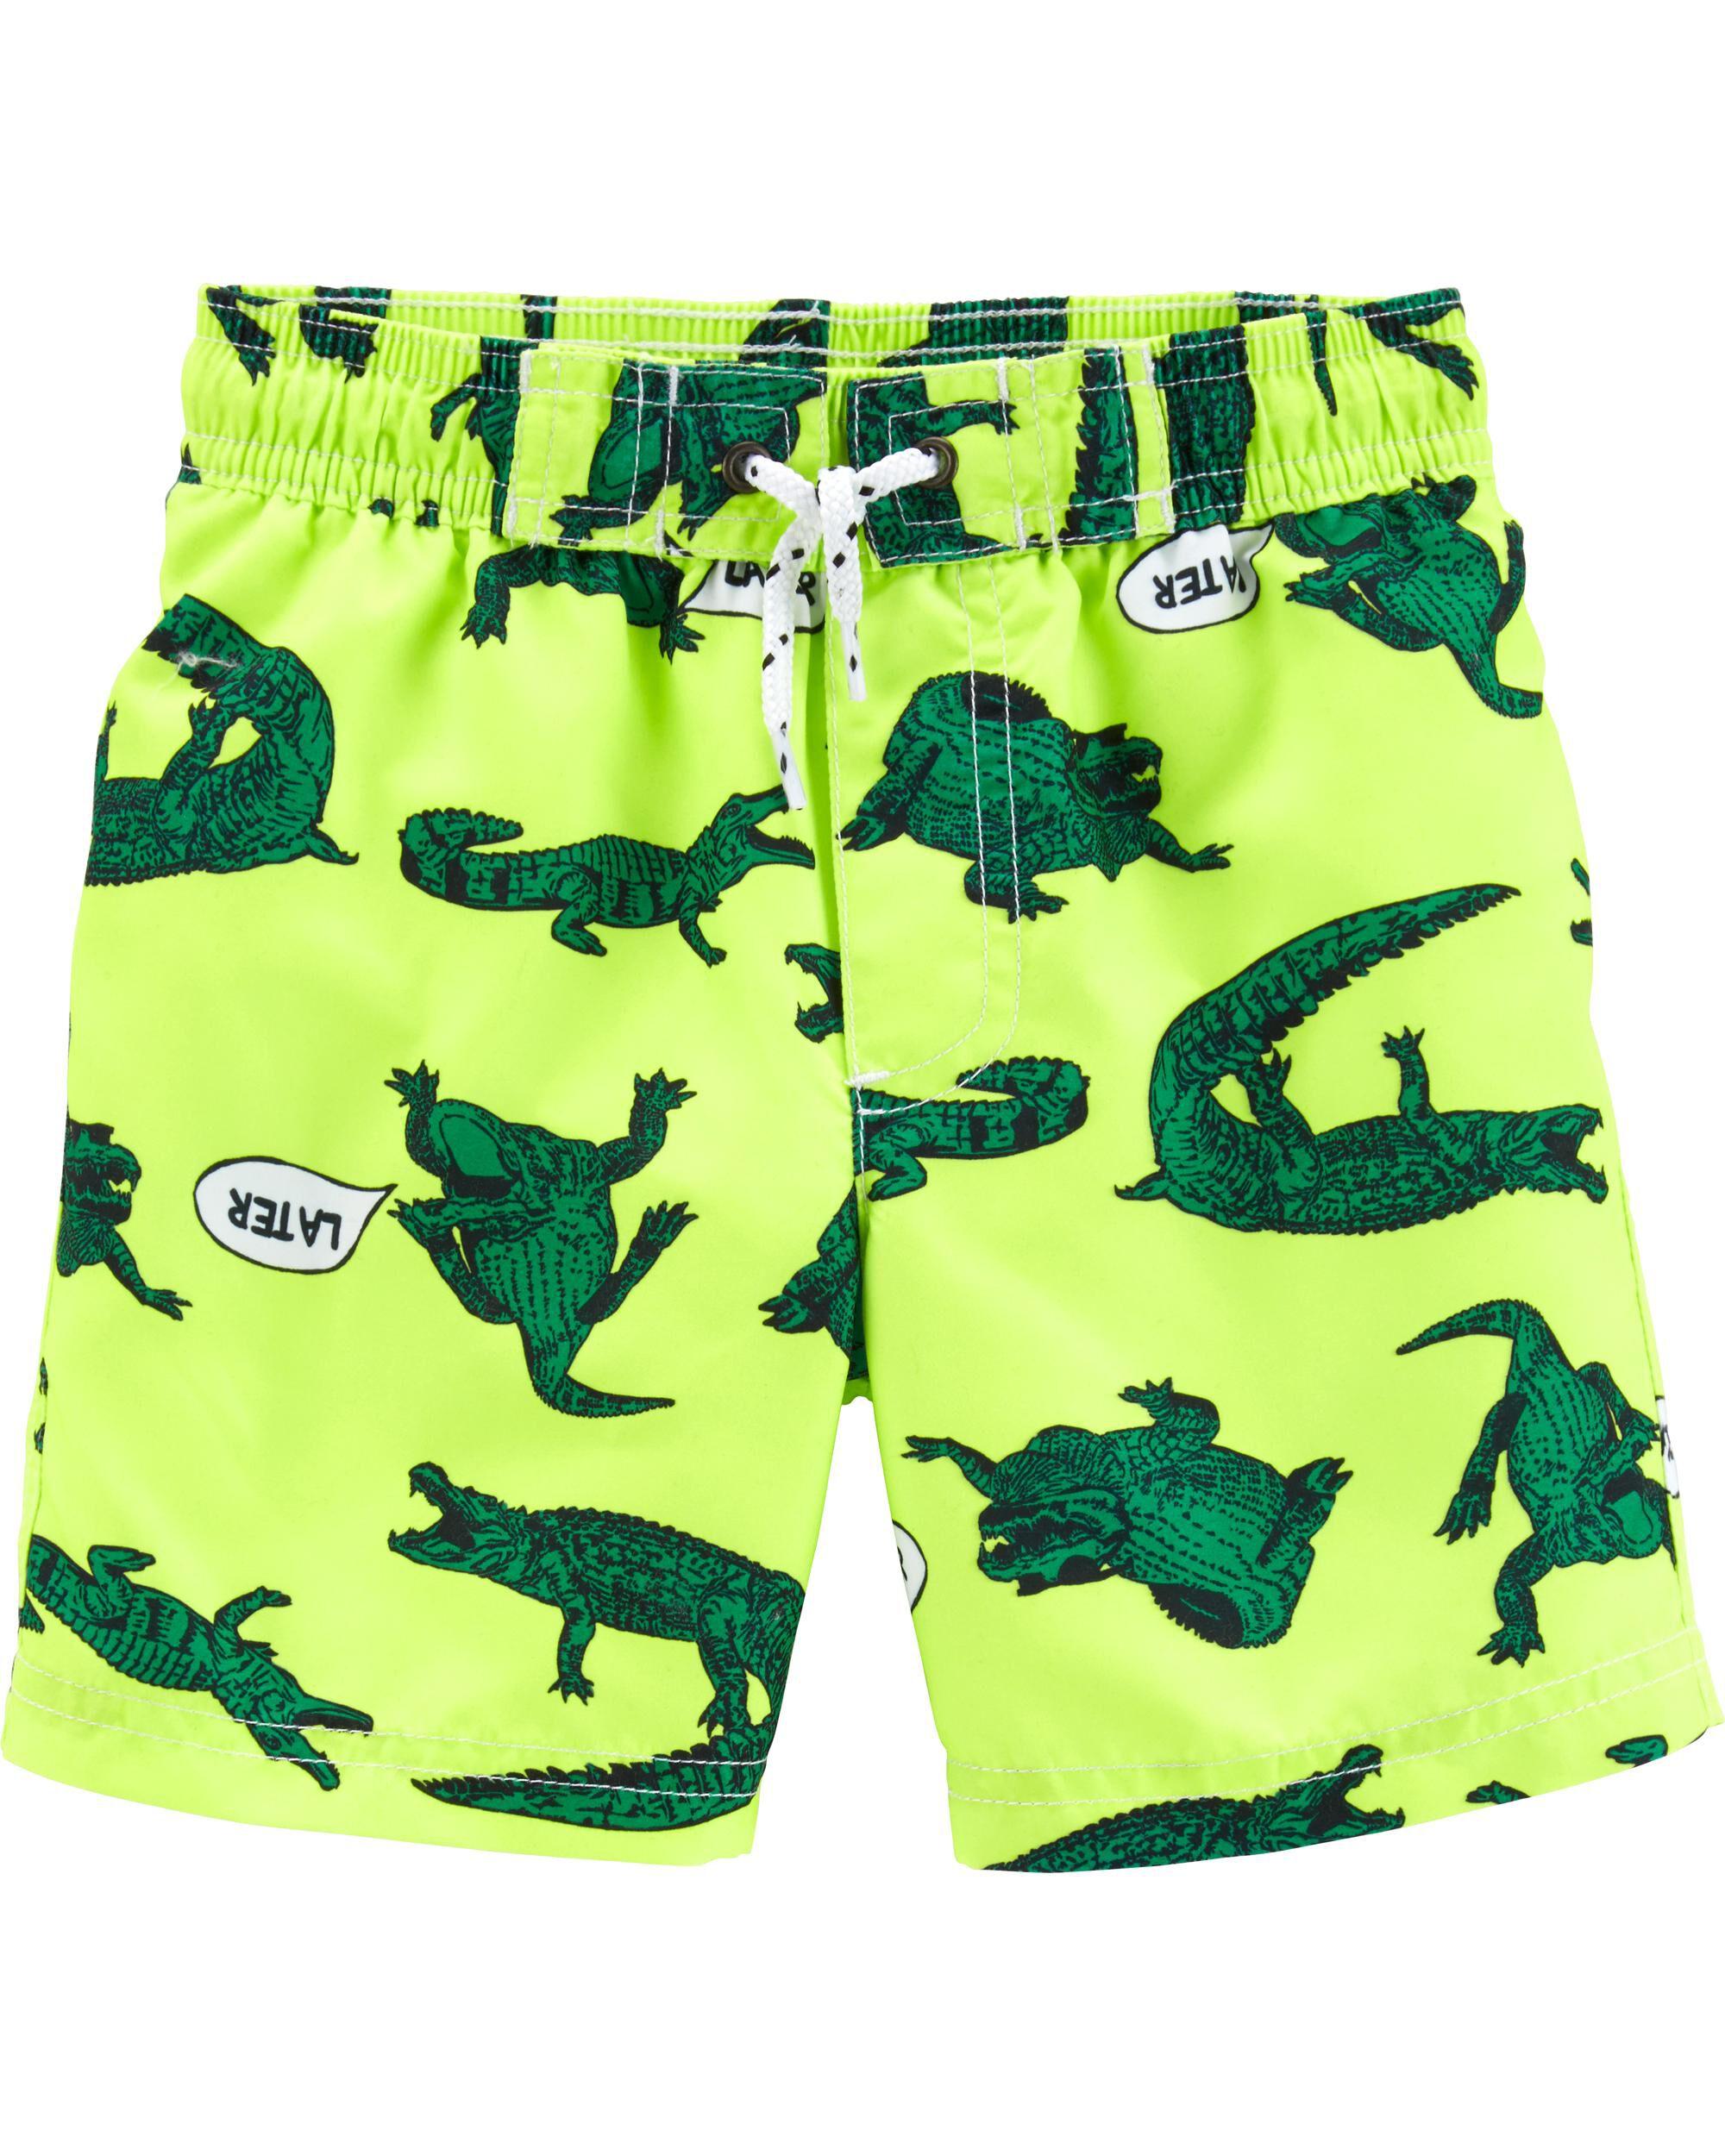 *Clearance*  Carter's Alligator Swim Trunks